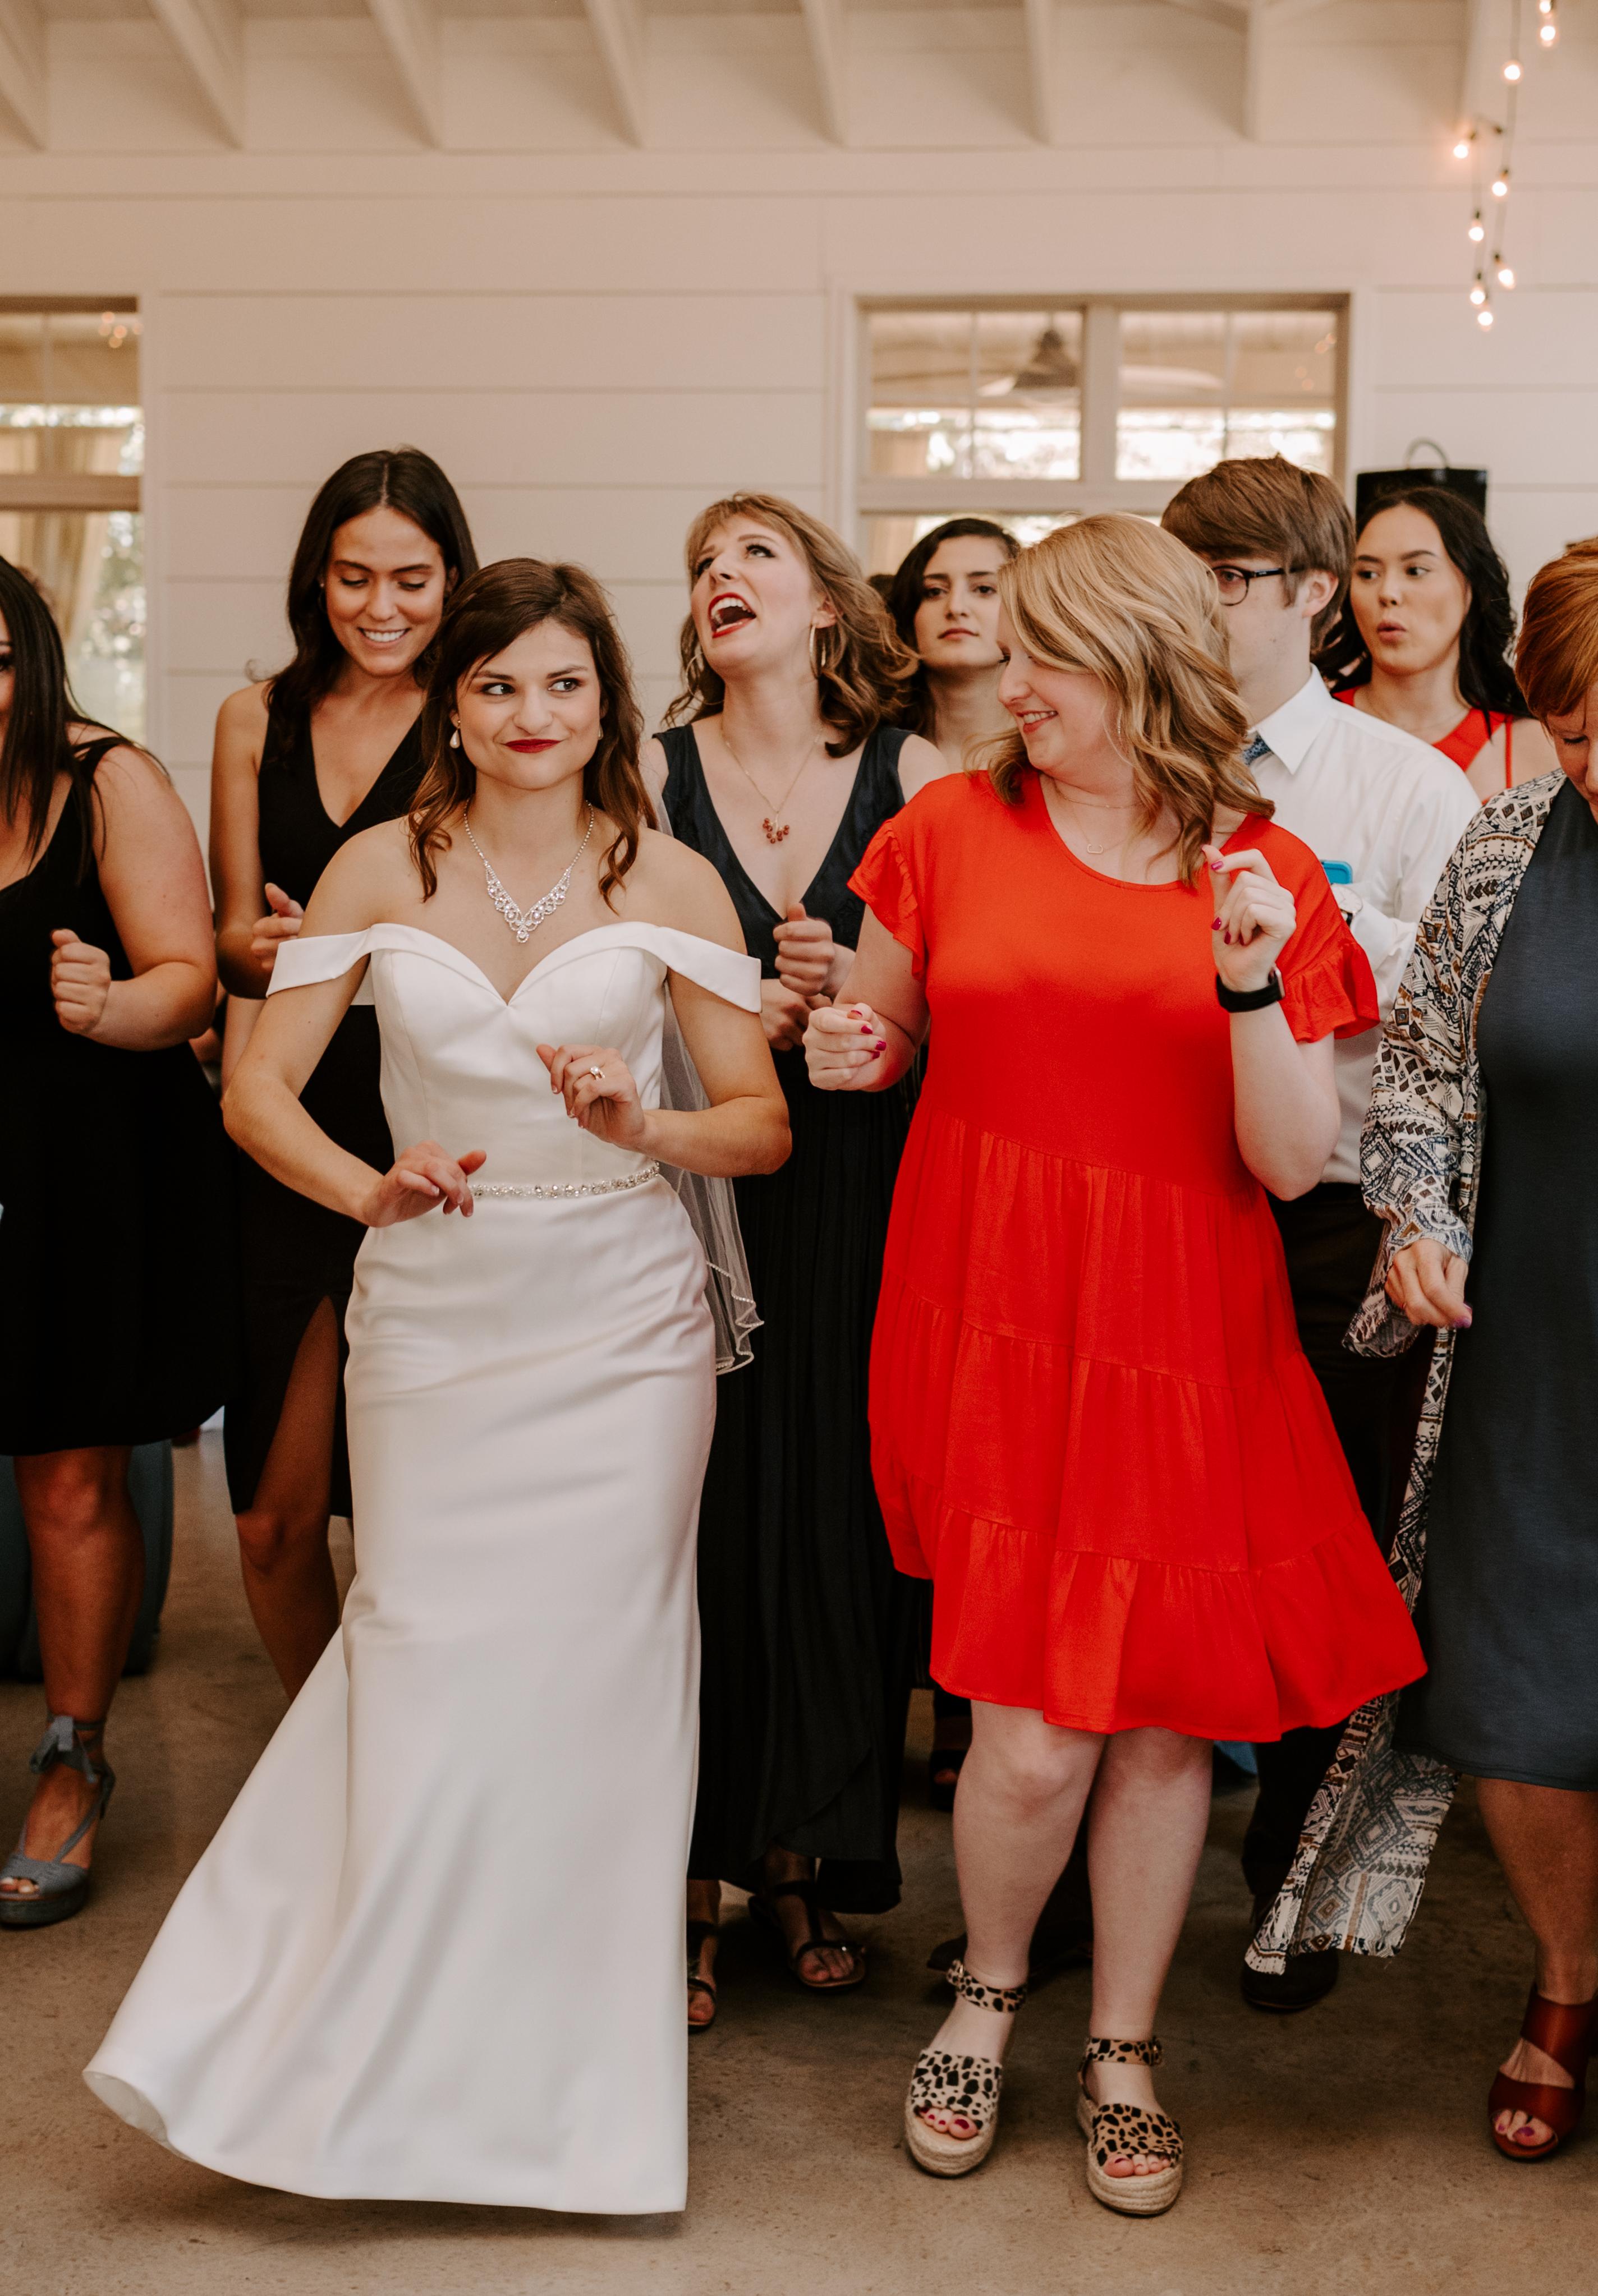 Bride doing line dance at wedding